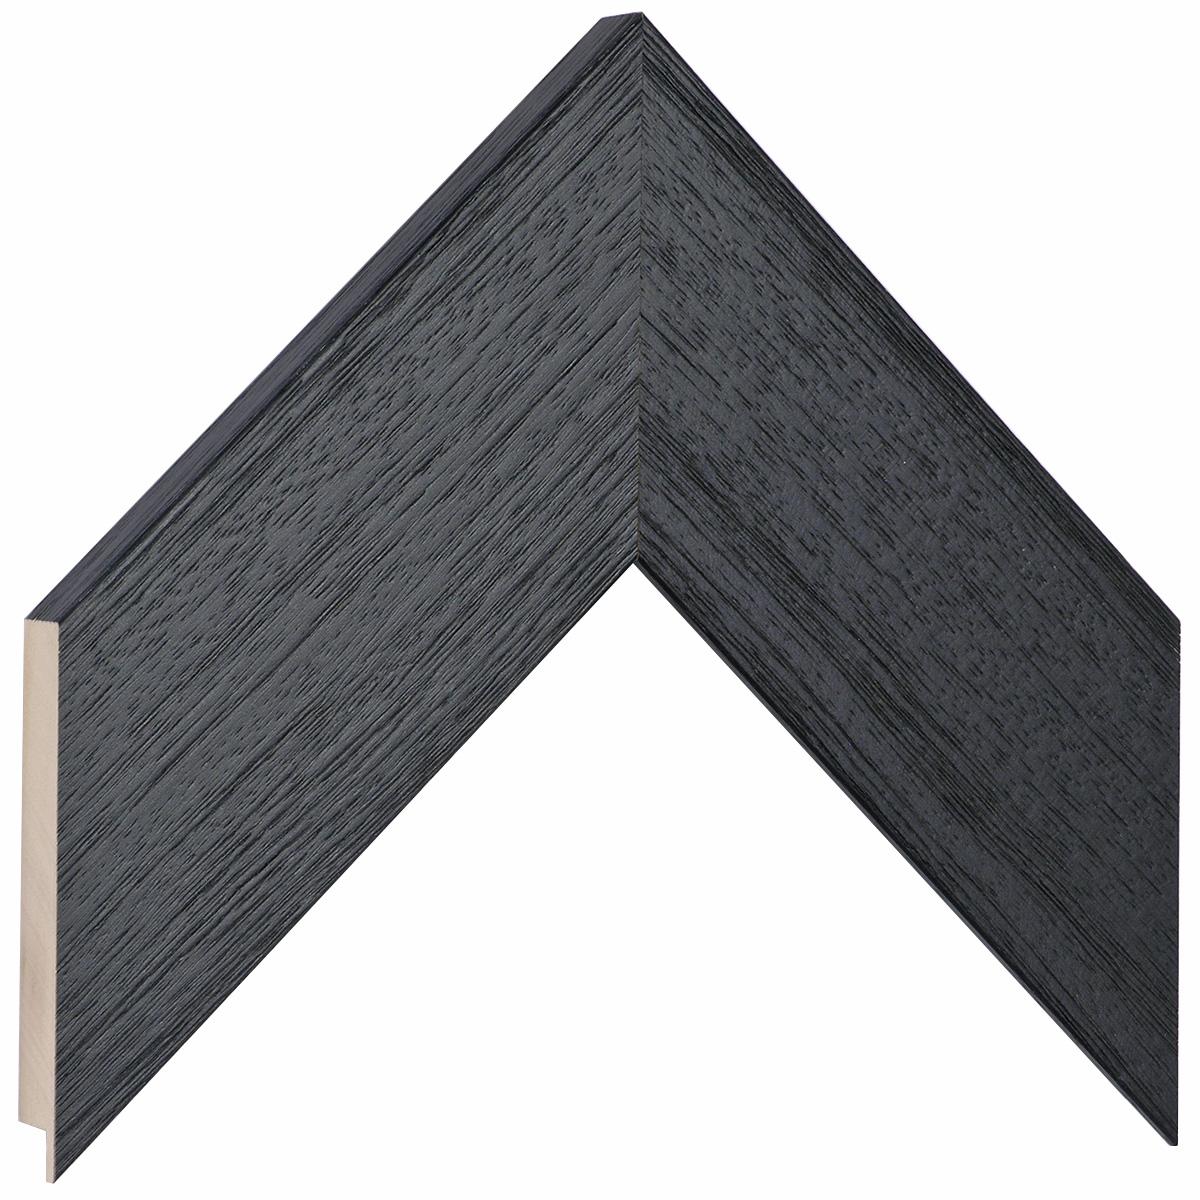 Moulding ayous, width 68mm height 20 - black, open grain